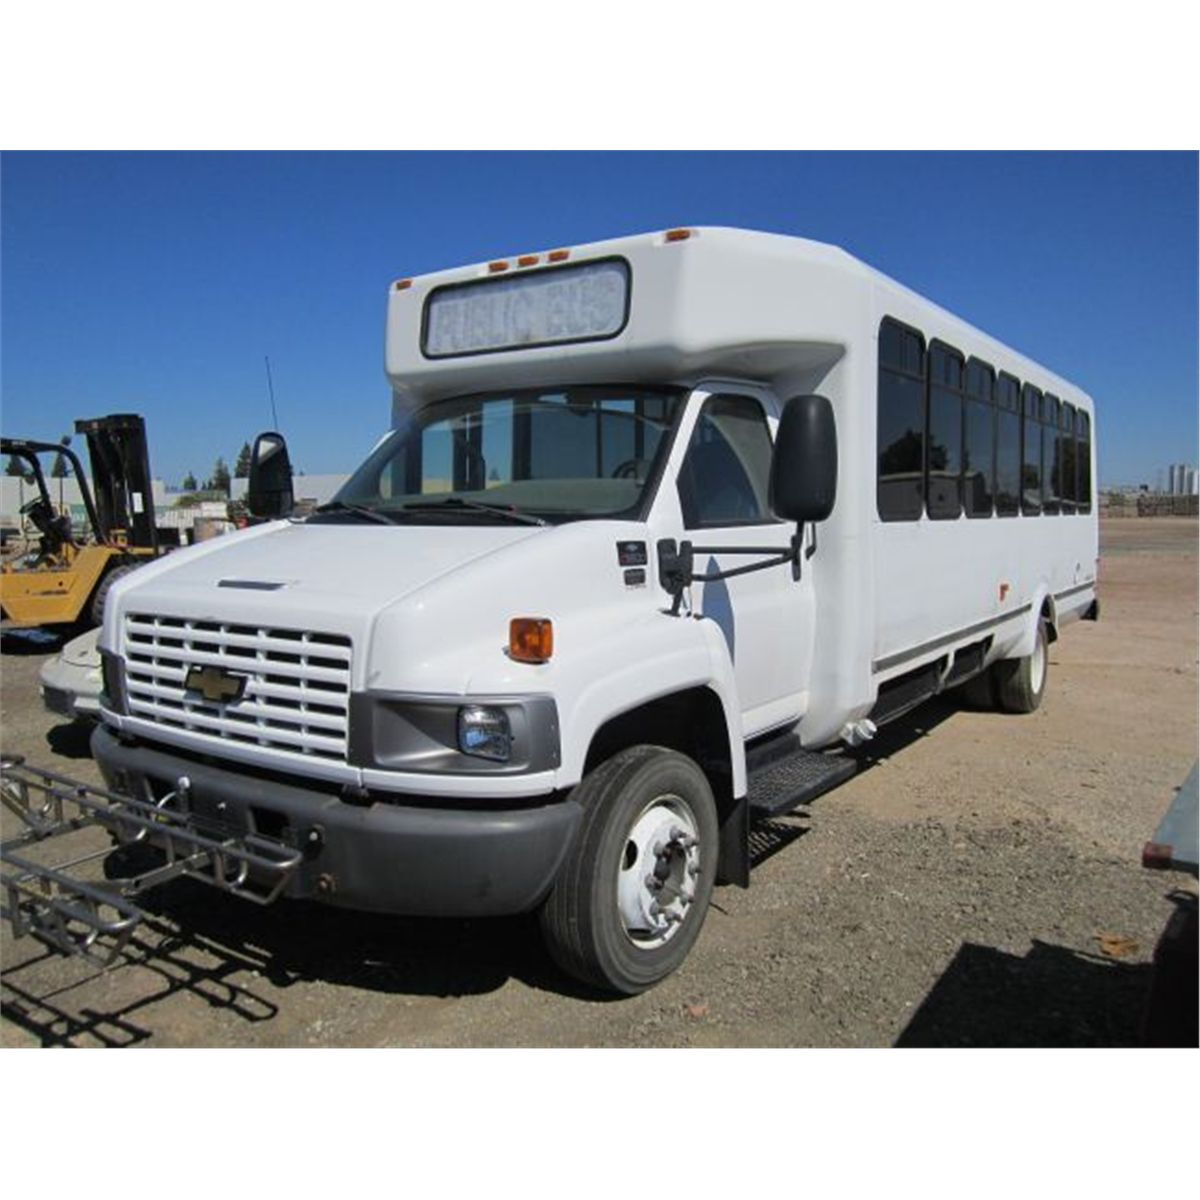 All Chevy chevy c5500 bus : 2004 Chevrolet C5500 Aero Elite S/A Transit Bus